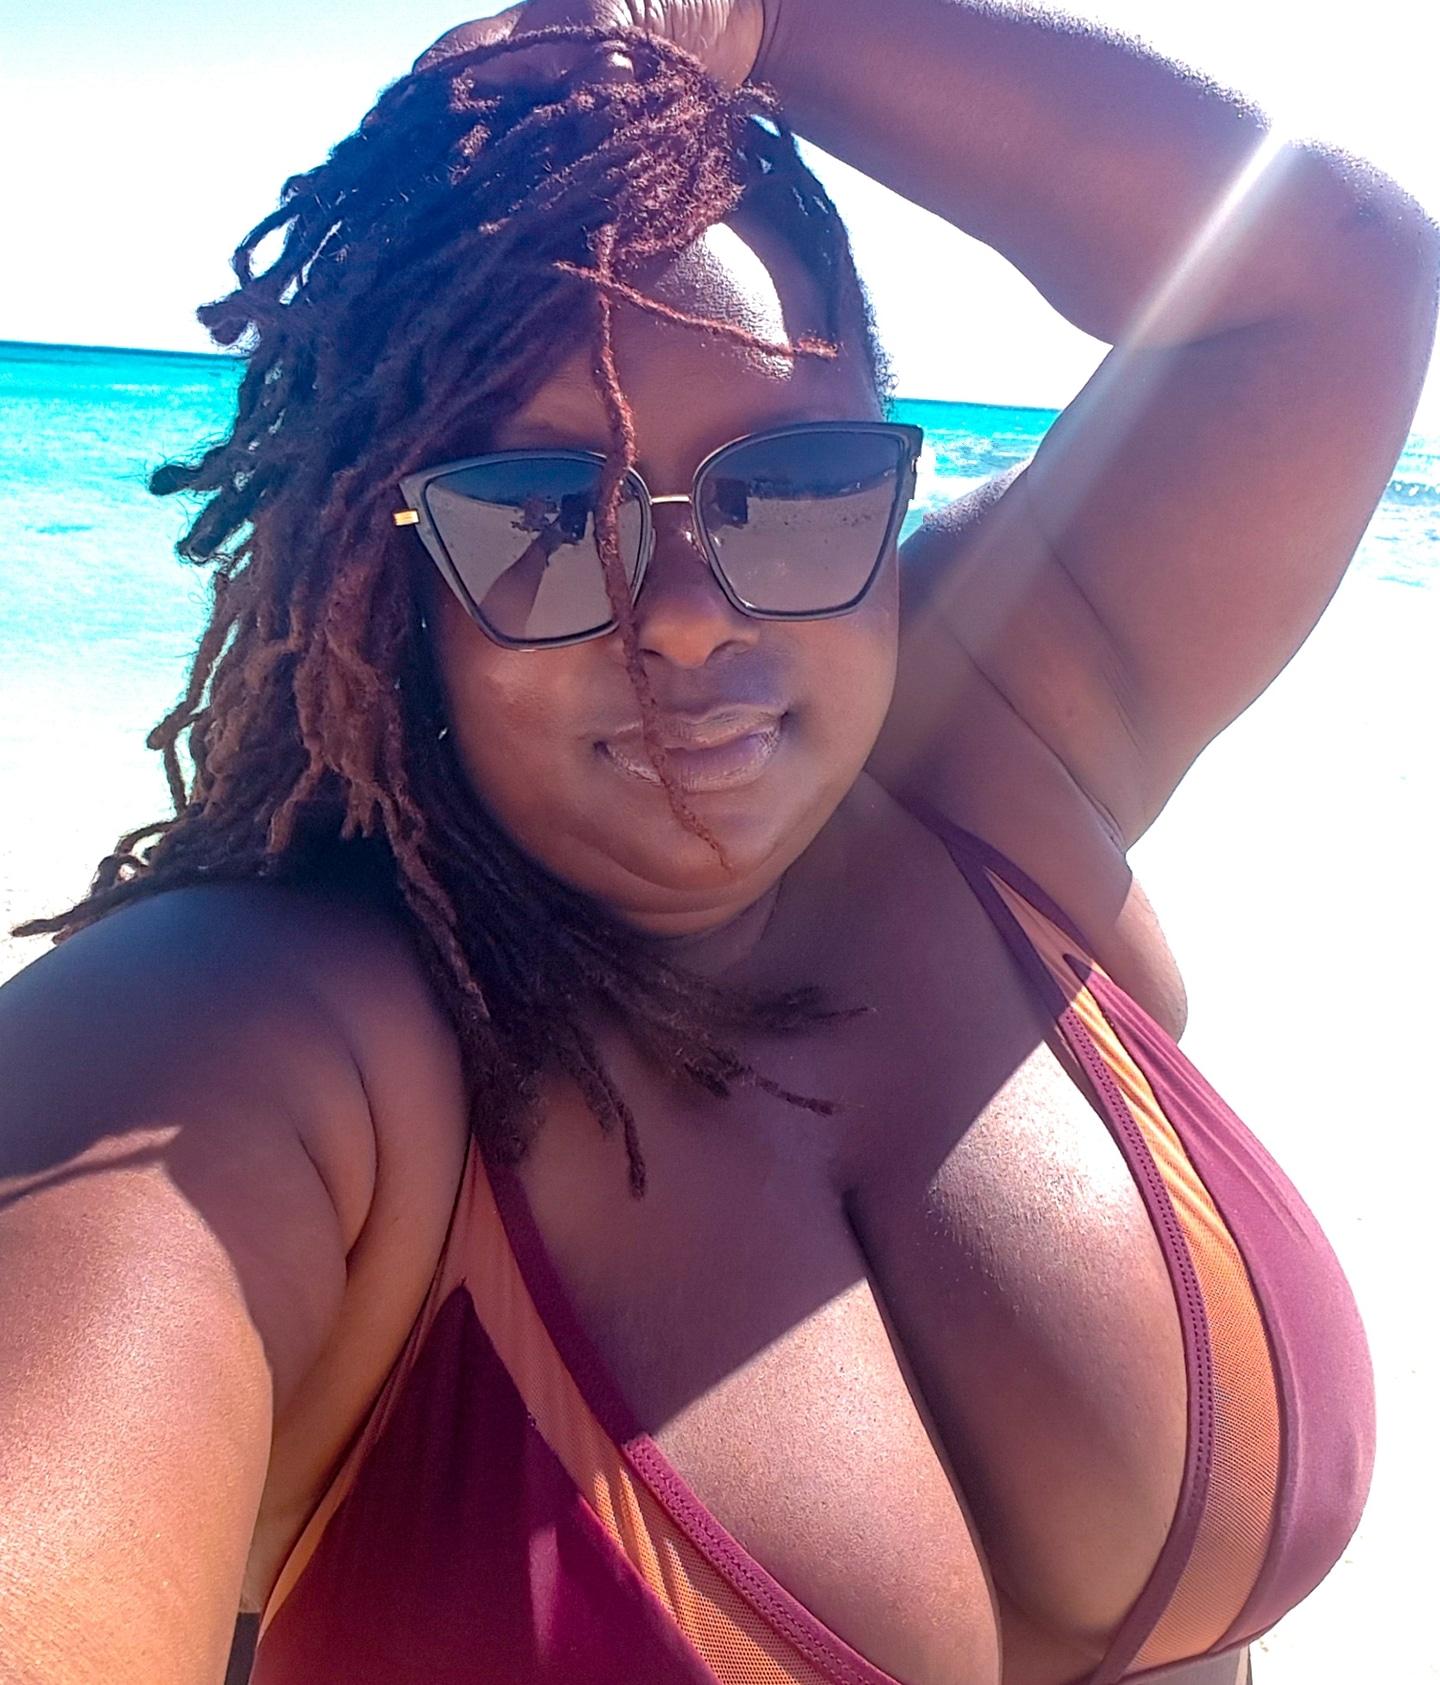 I had to do the bikini selfie.